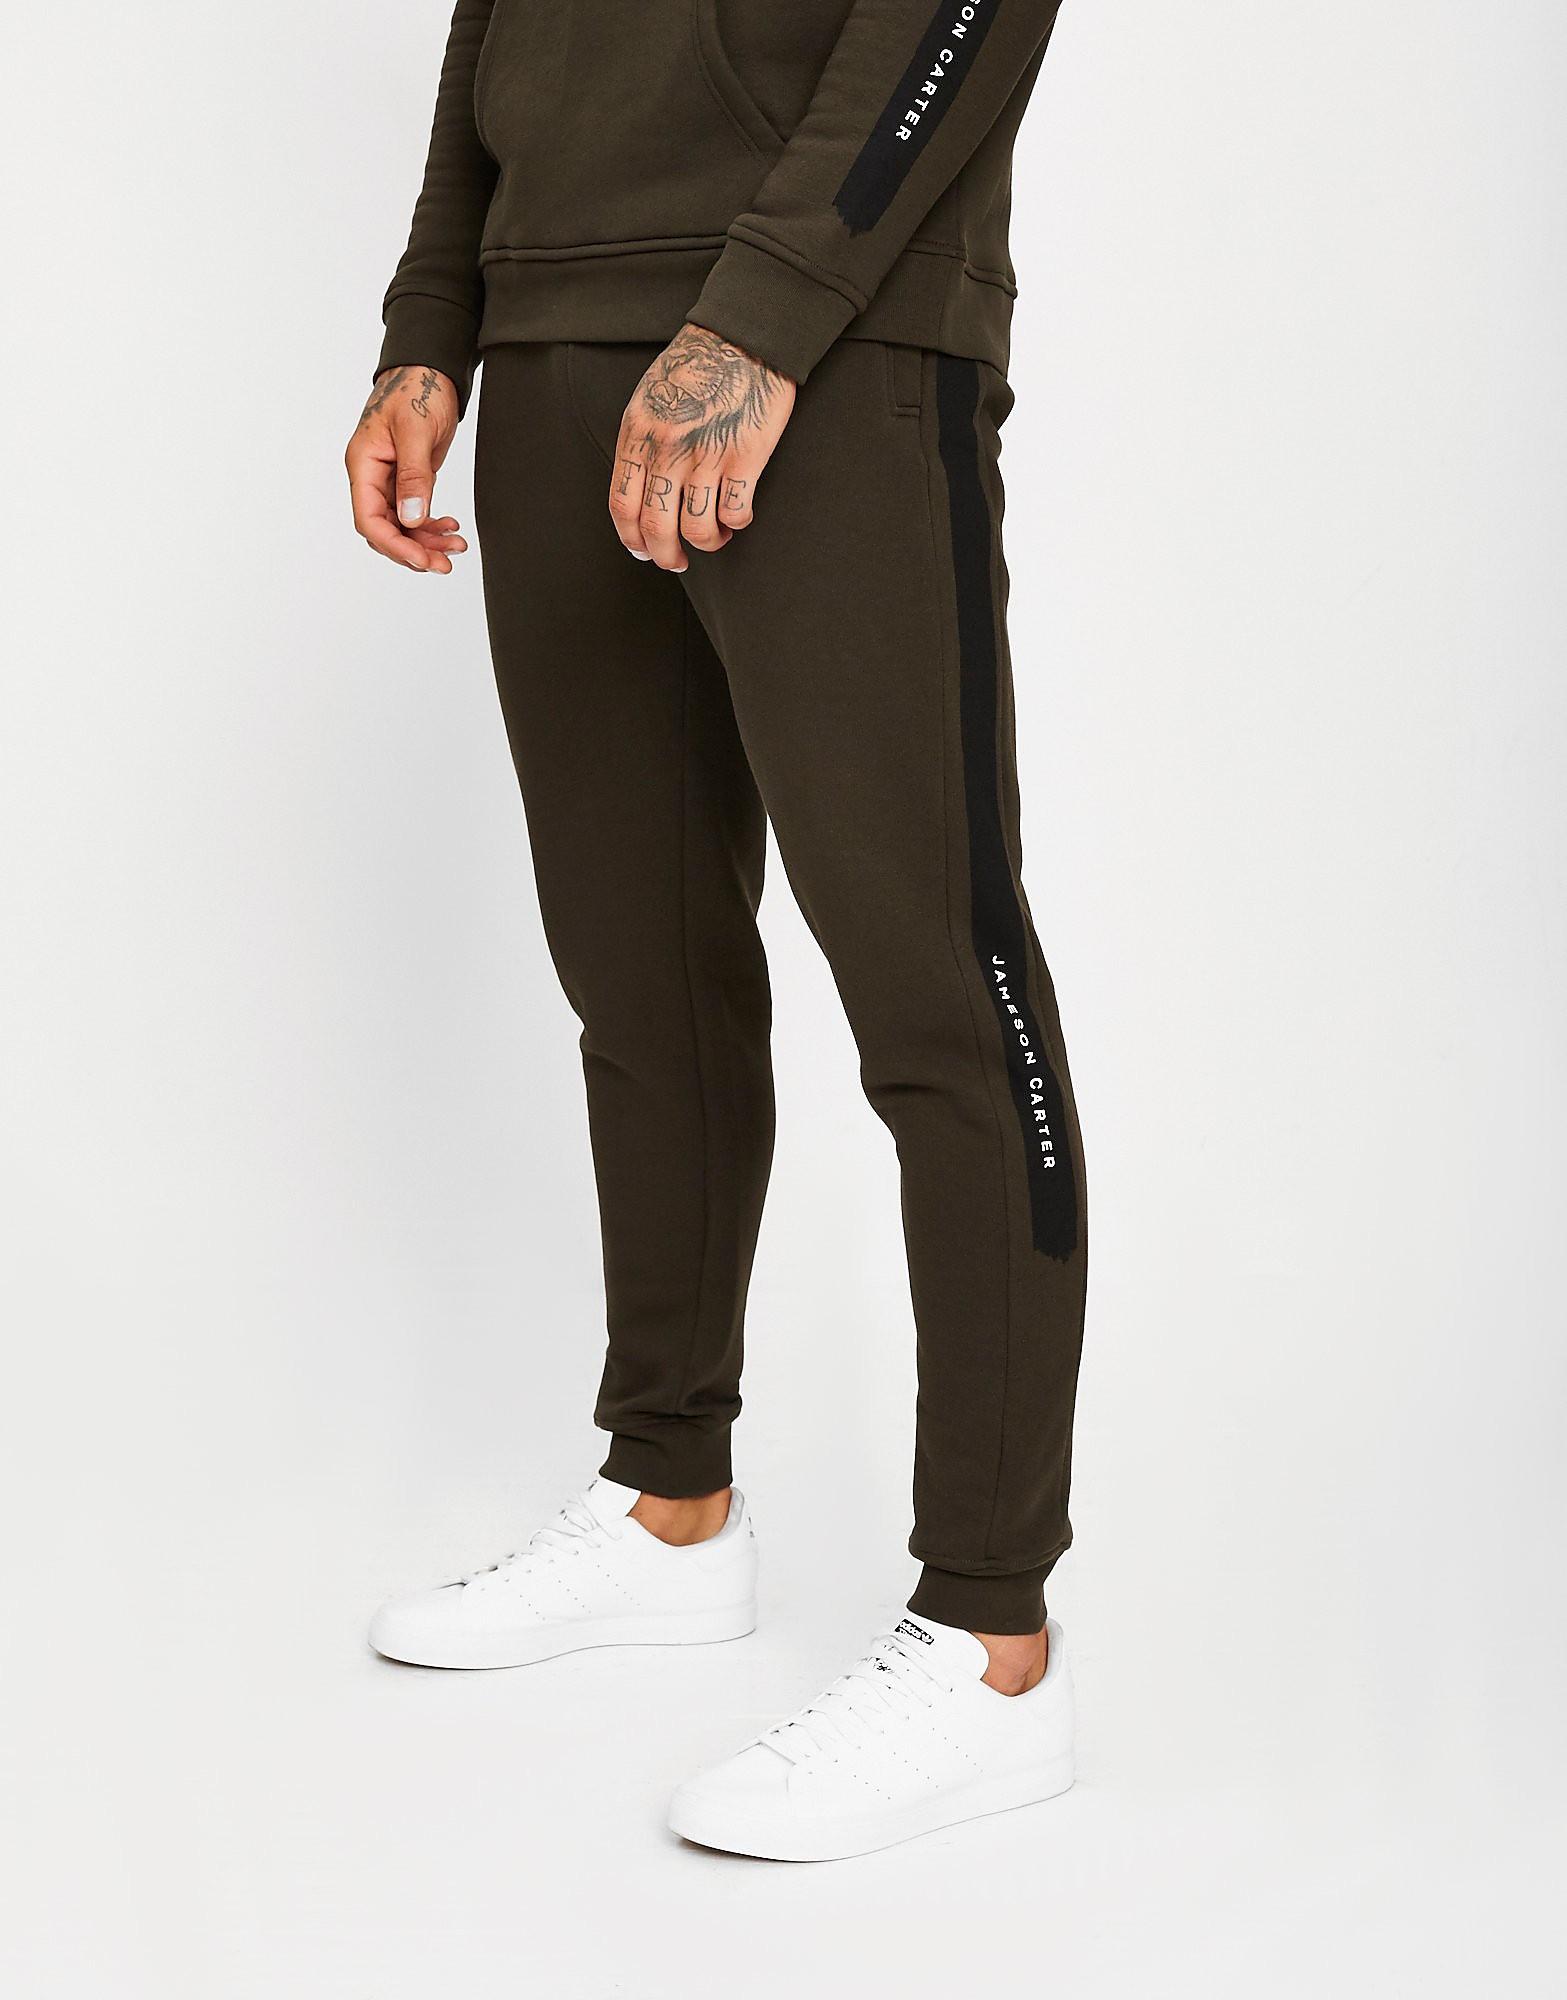 JAMESON CARTER Pantalon de survêtement Paint Stripe Homme - Only at JD - Khaki, Khaki